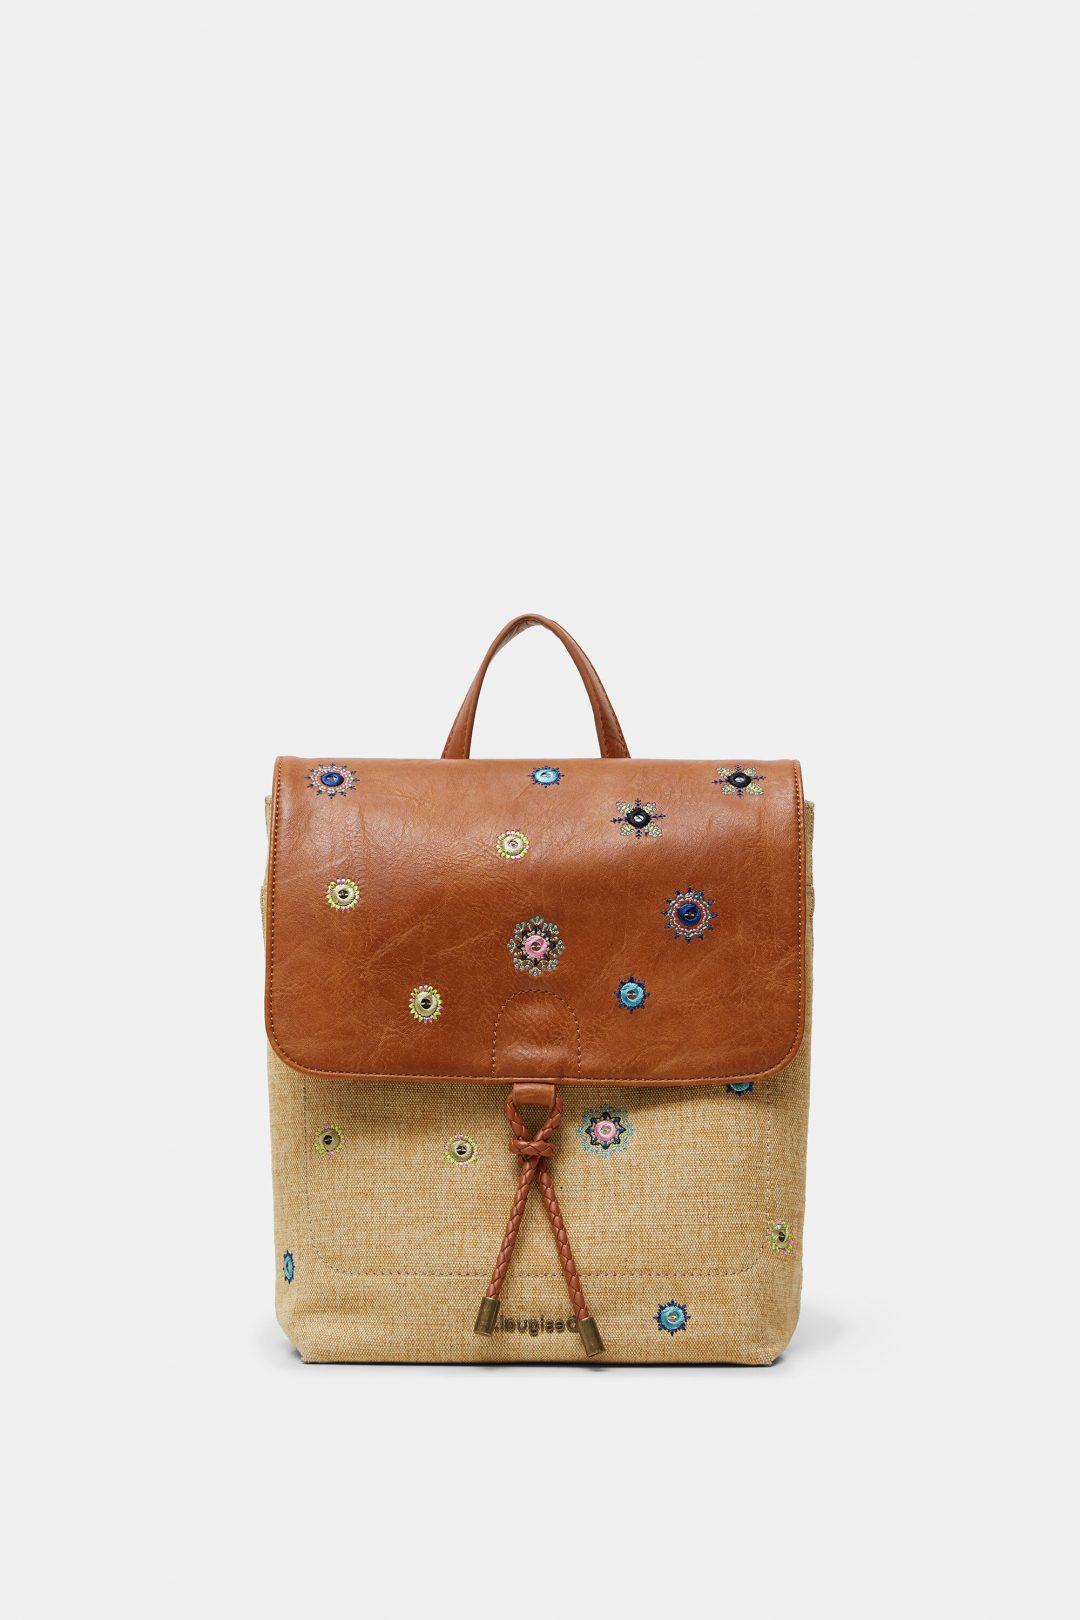 Desigual ruksak 599kn, Vikend+ cijena 479.20kn